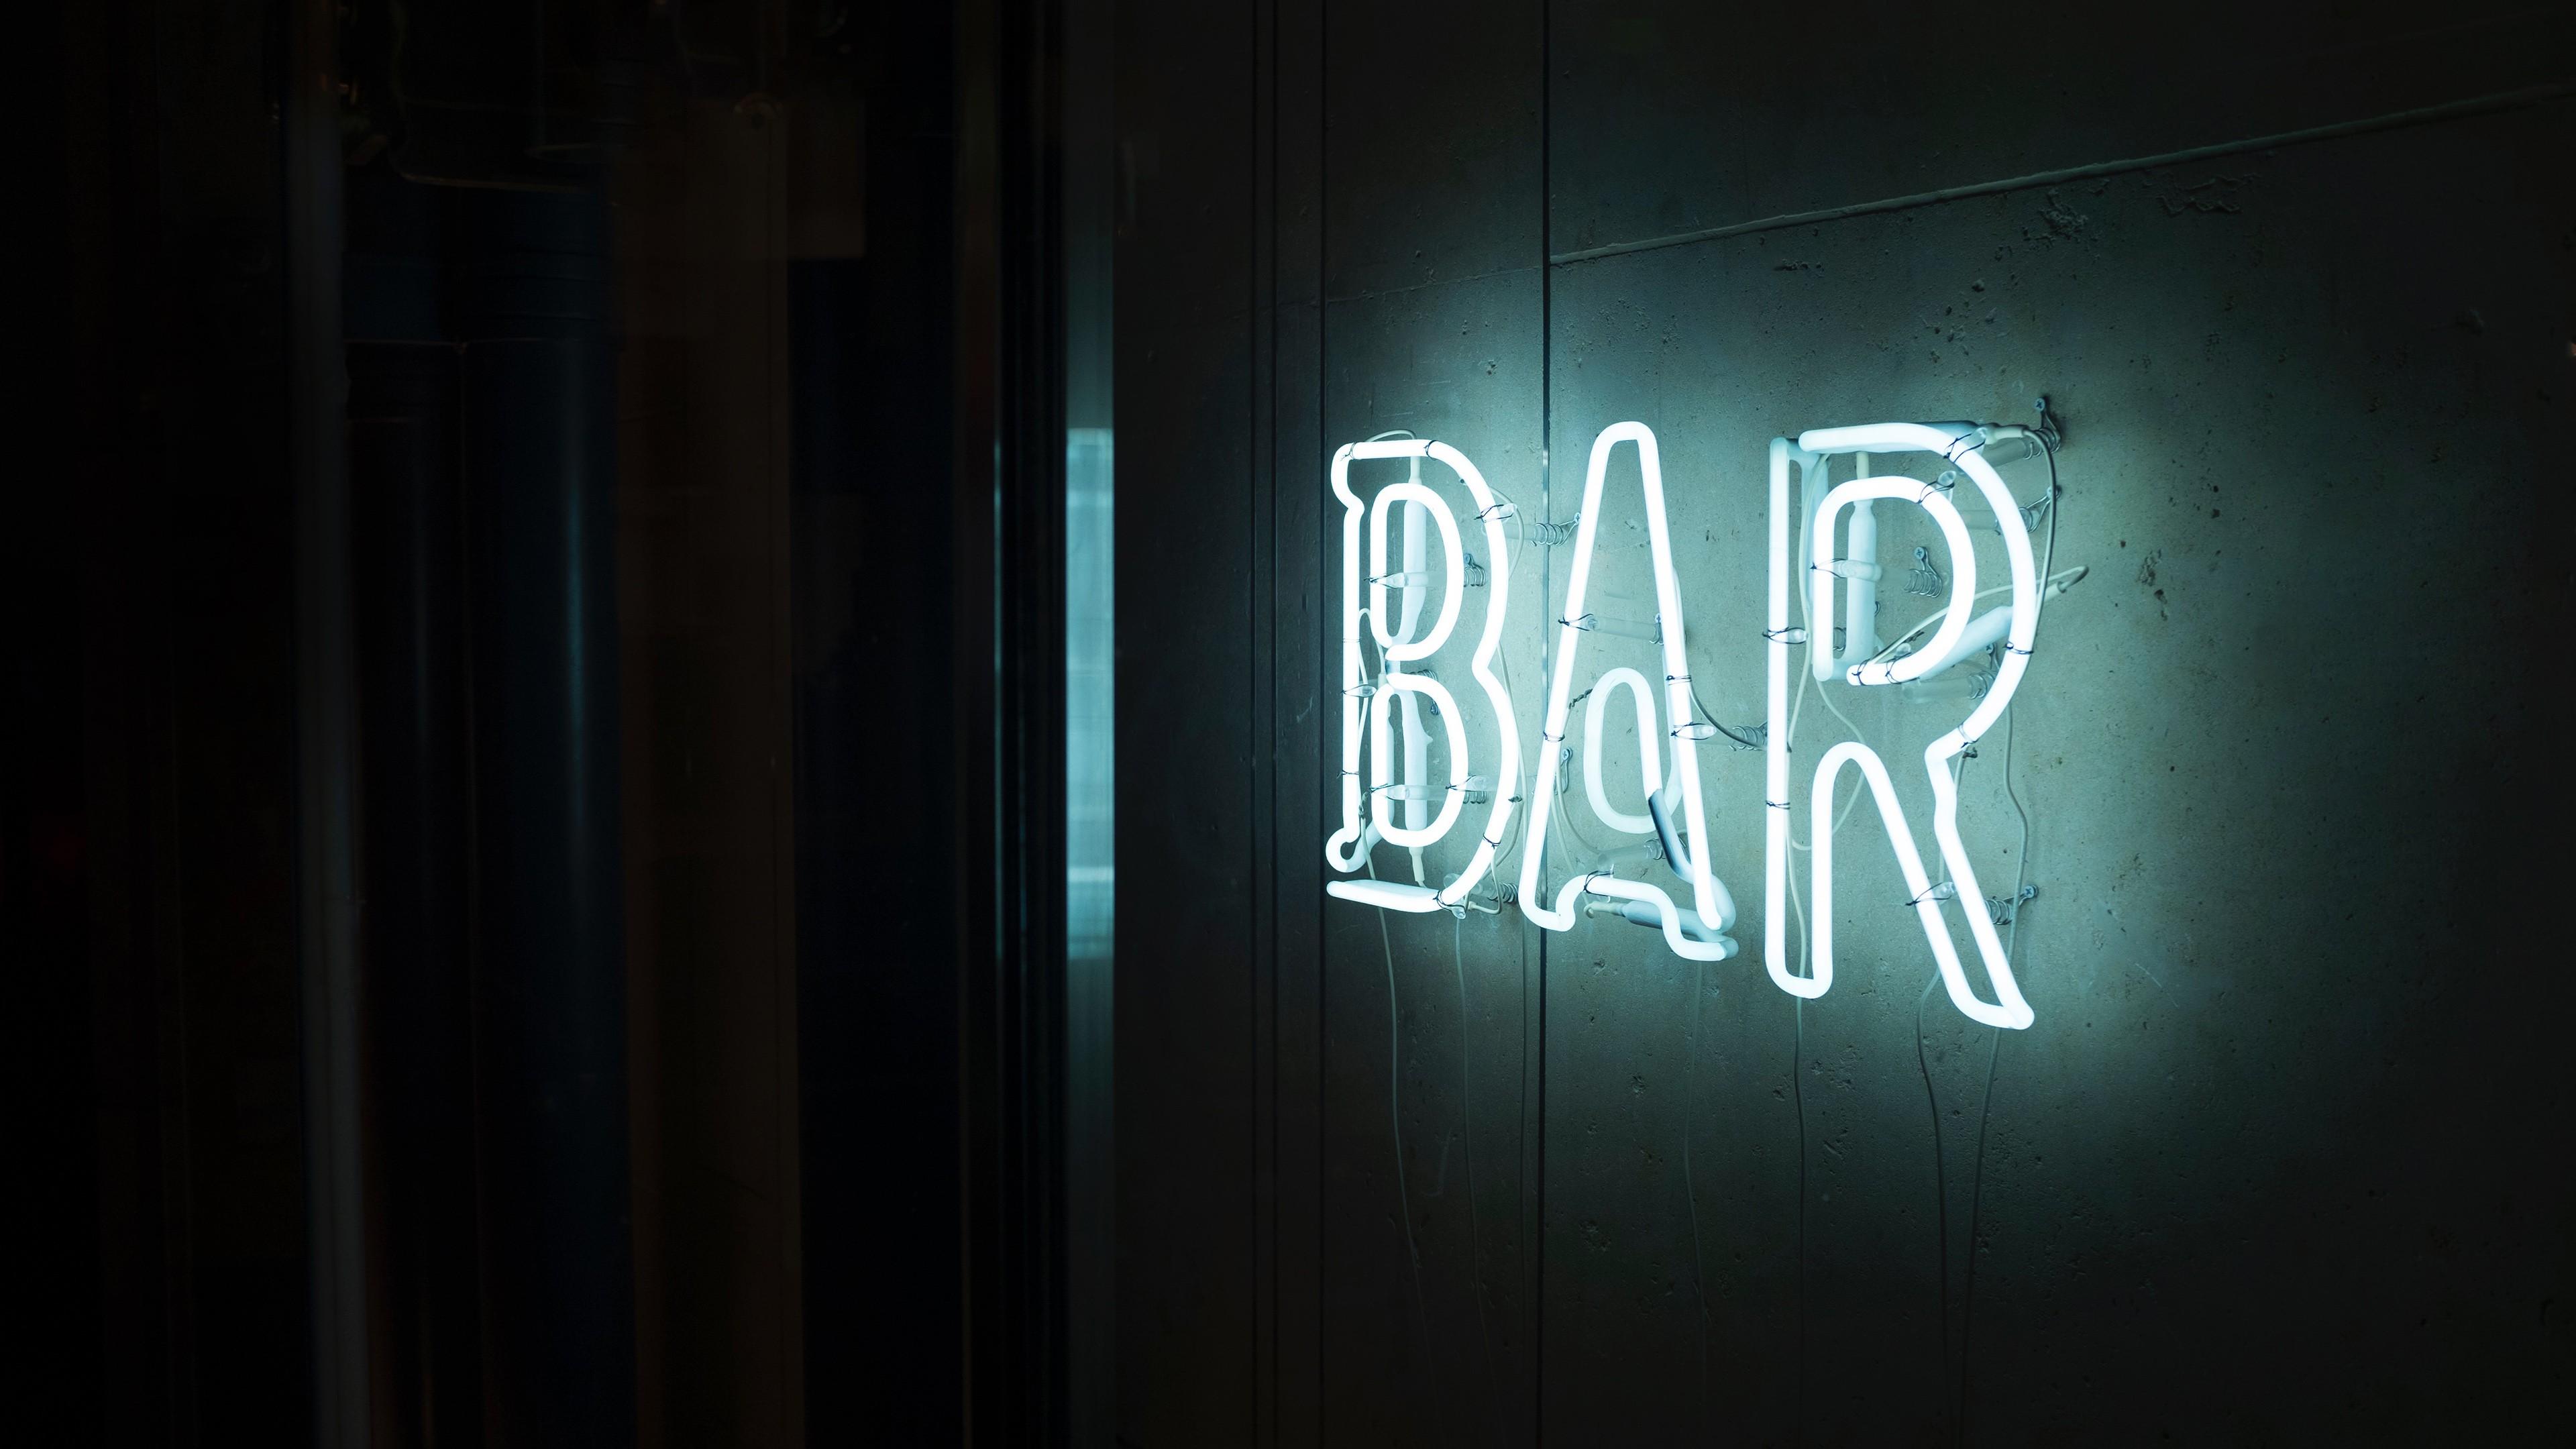 Wallpaper : black, night, photography, text, signs, bar